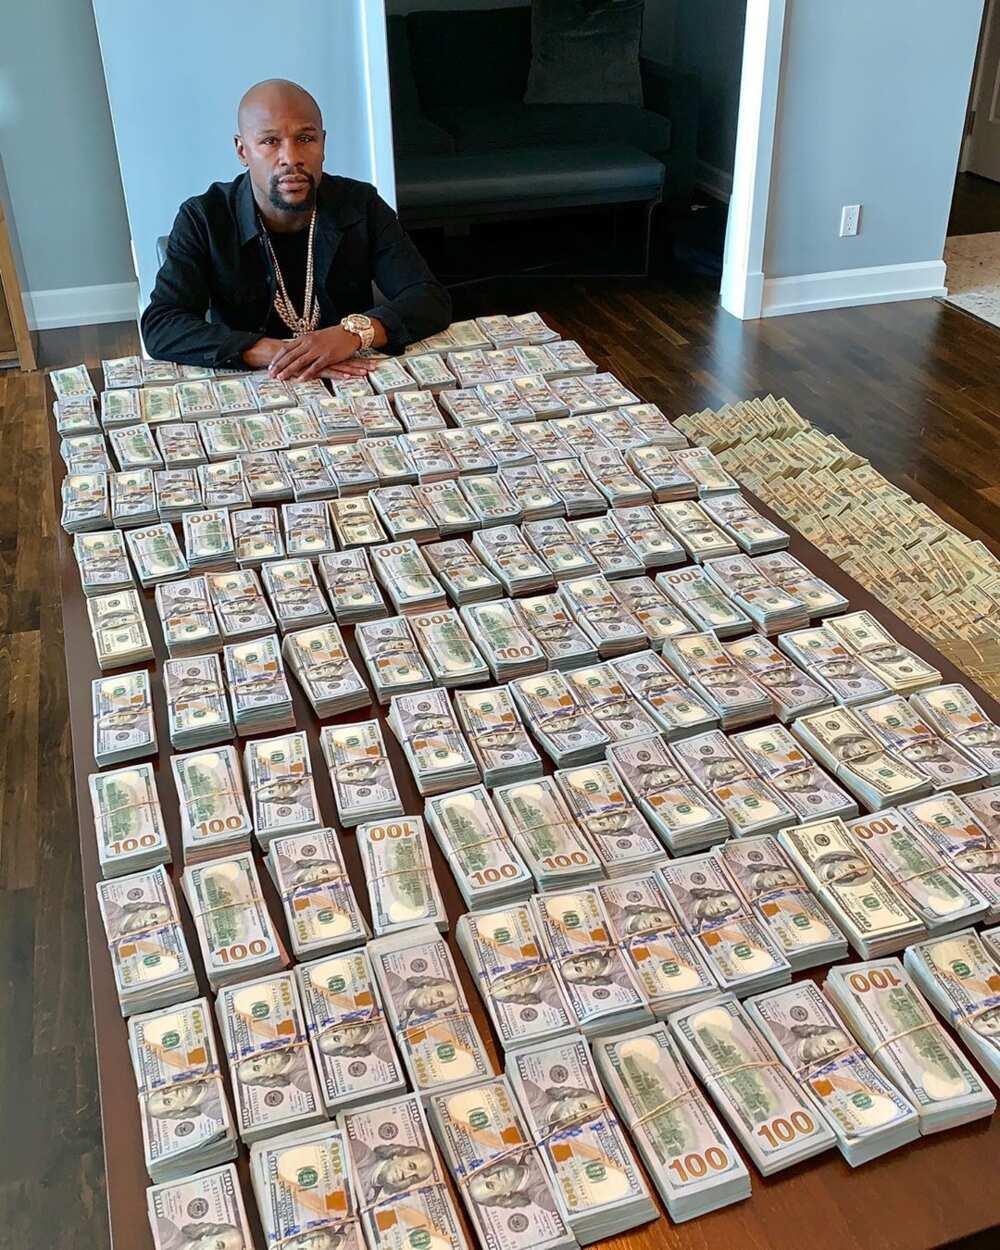 floyd mayweather net worth today